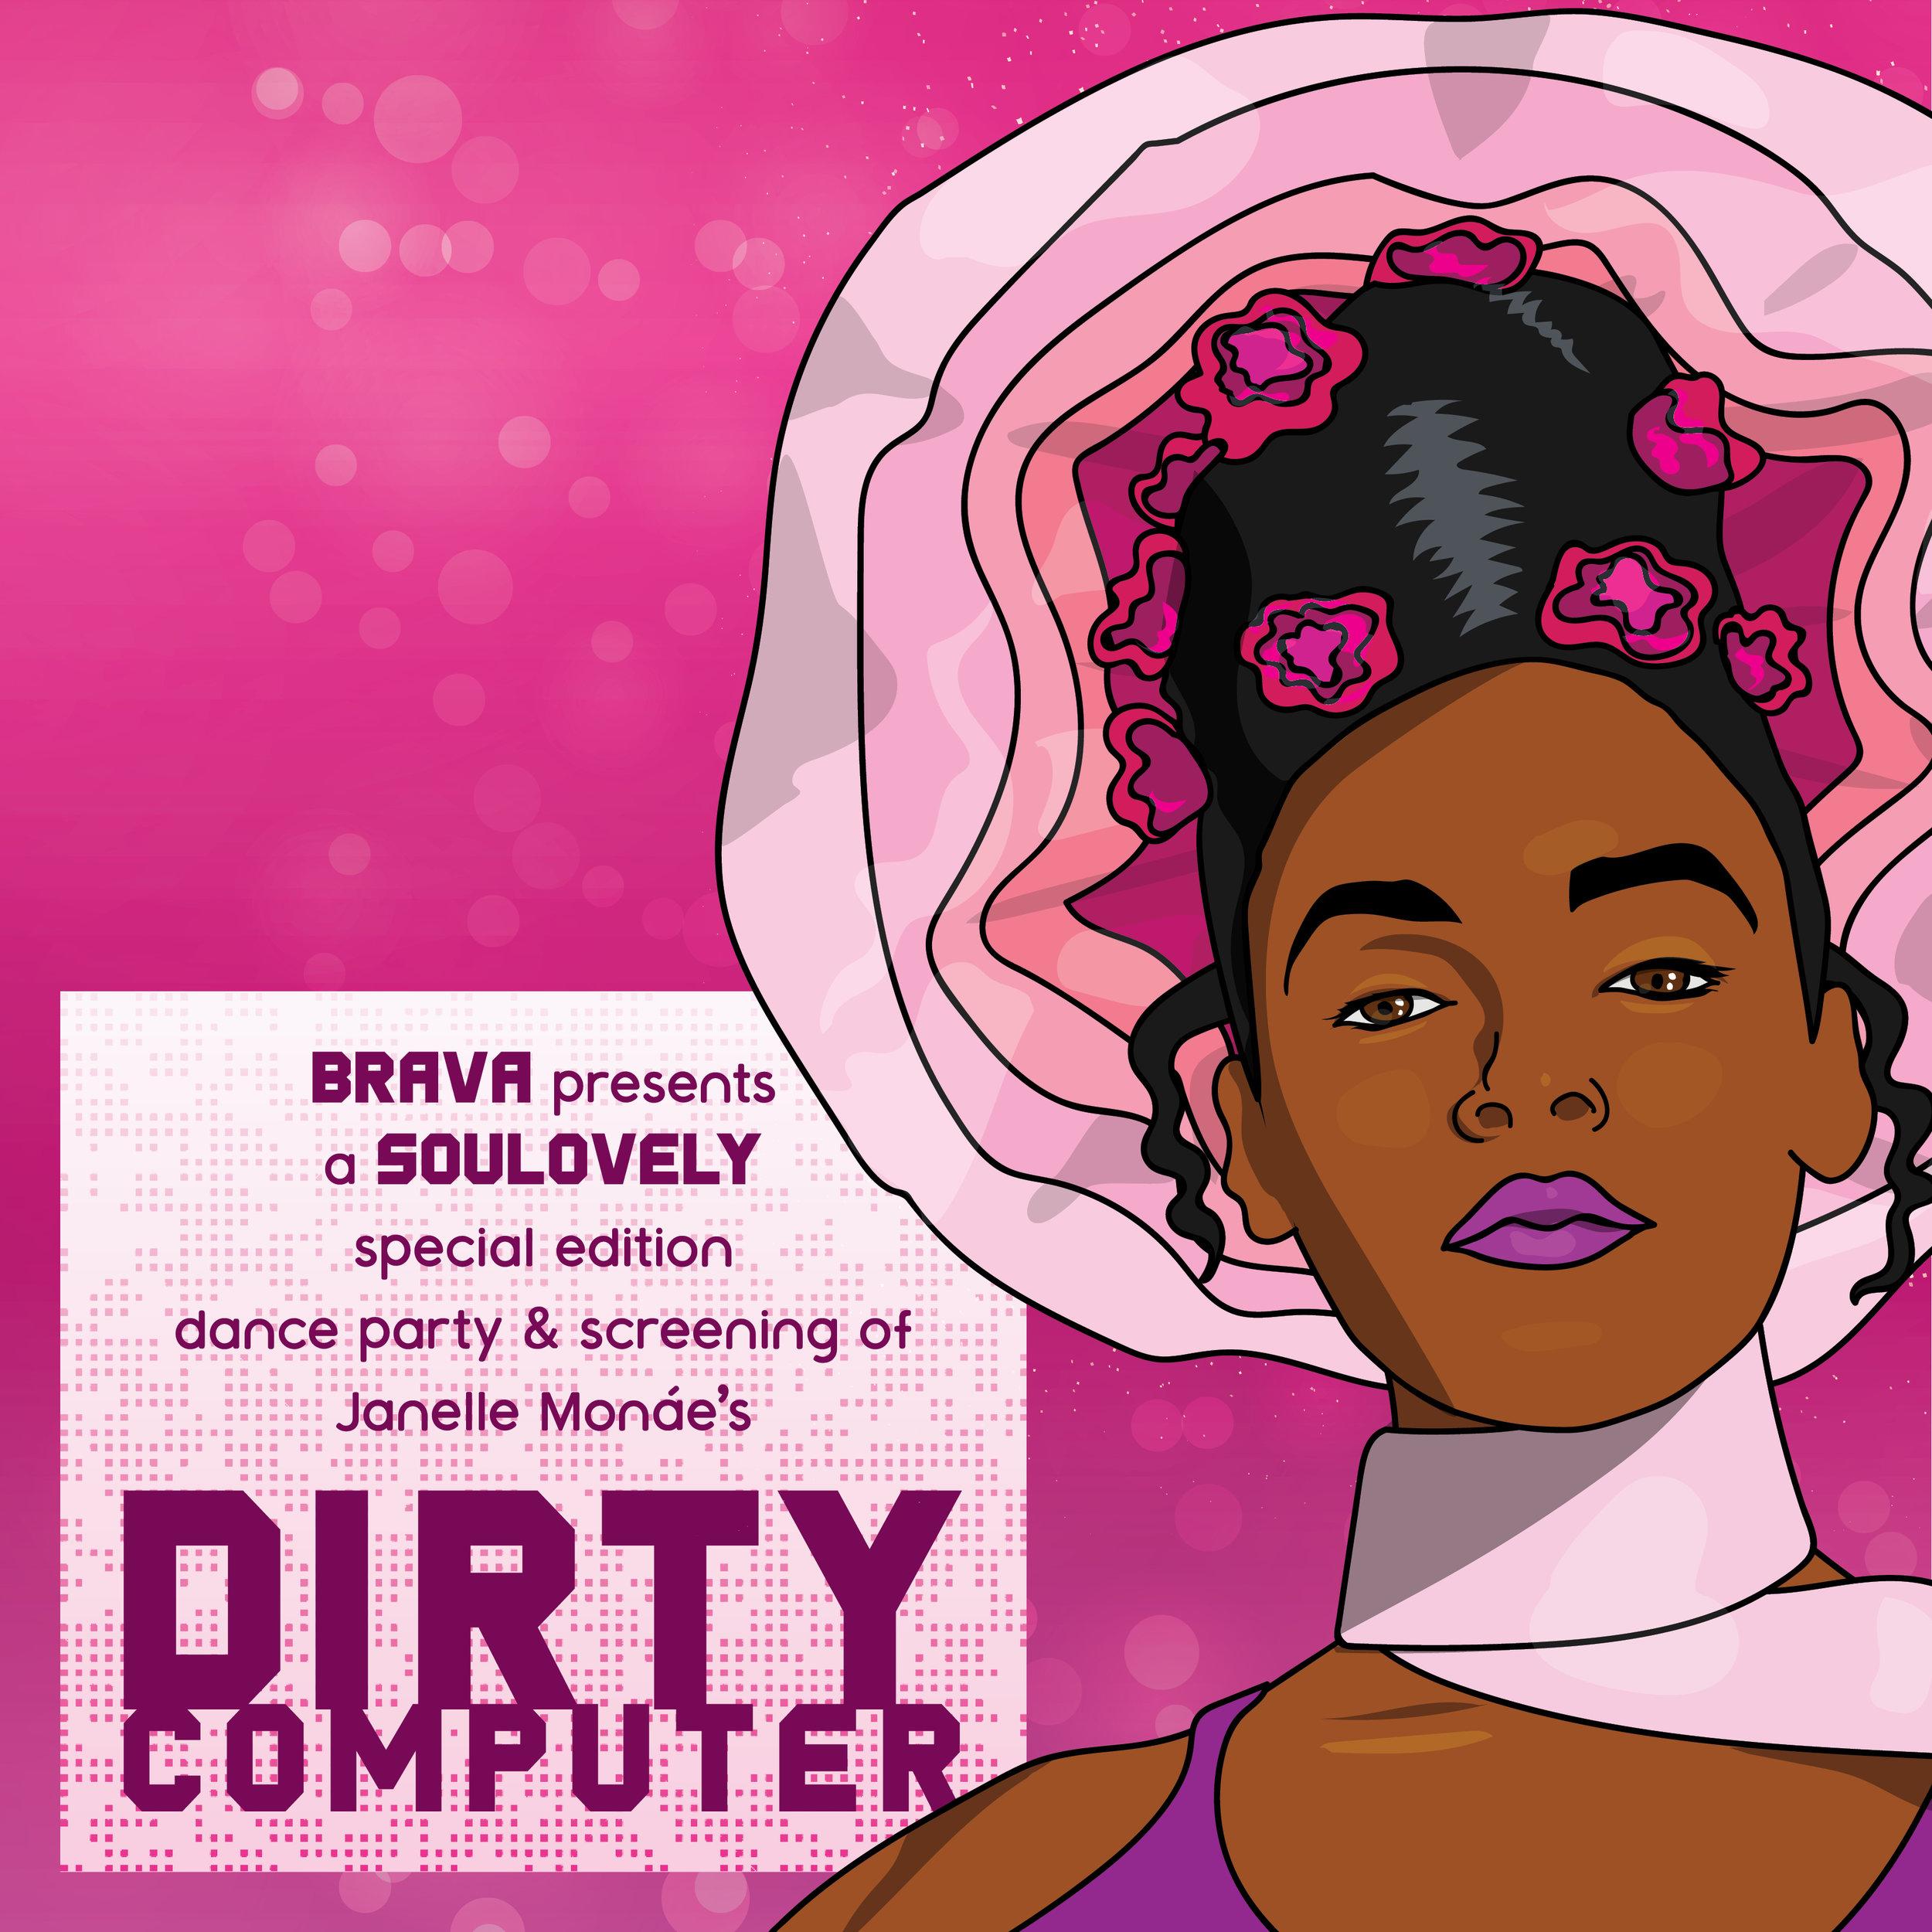 Dirty Computer, Brava, social media square 8-22-18.jpg